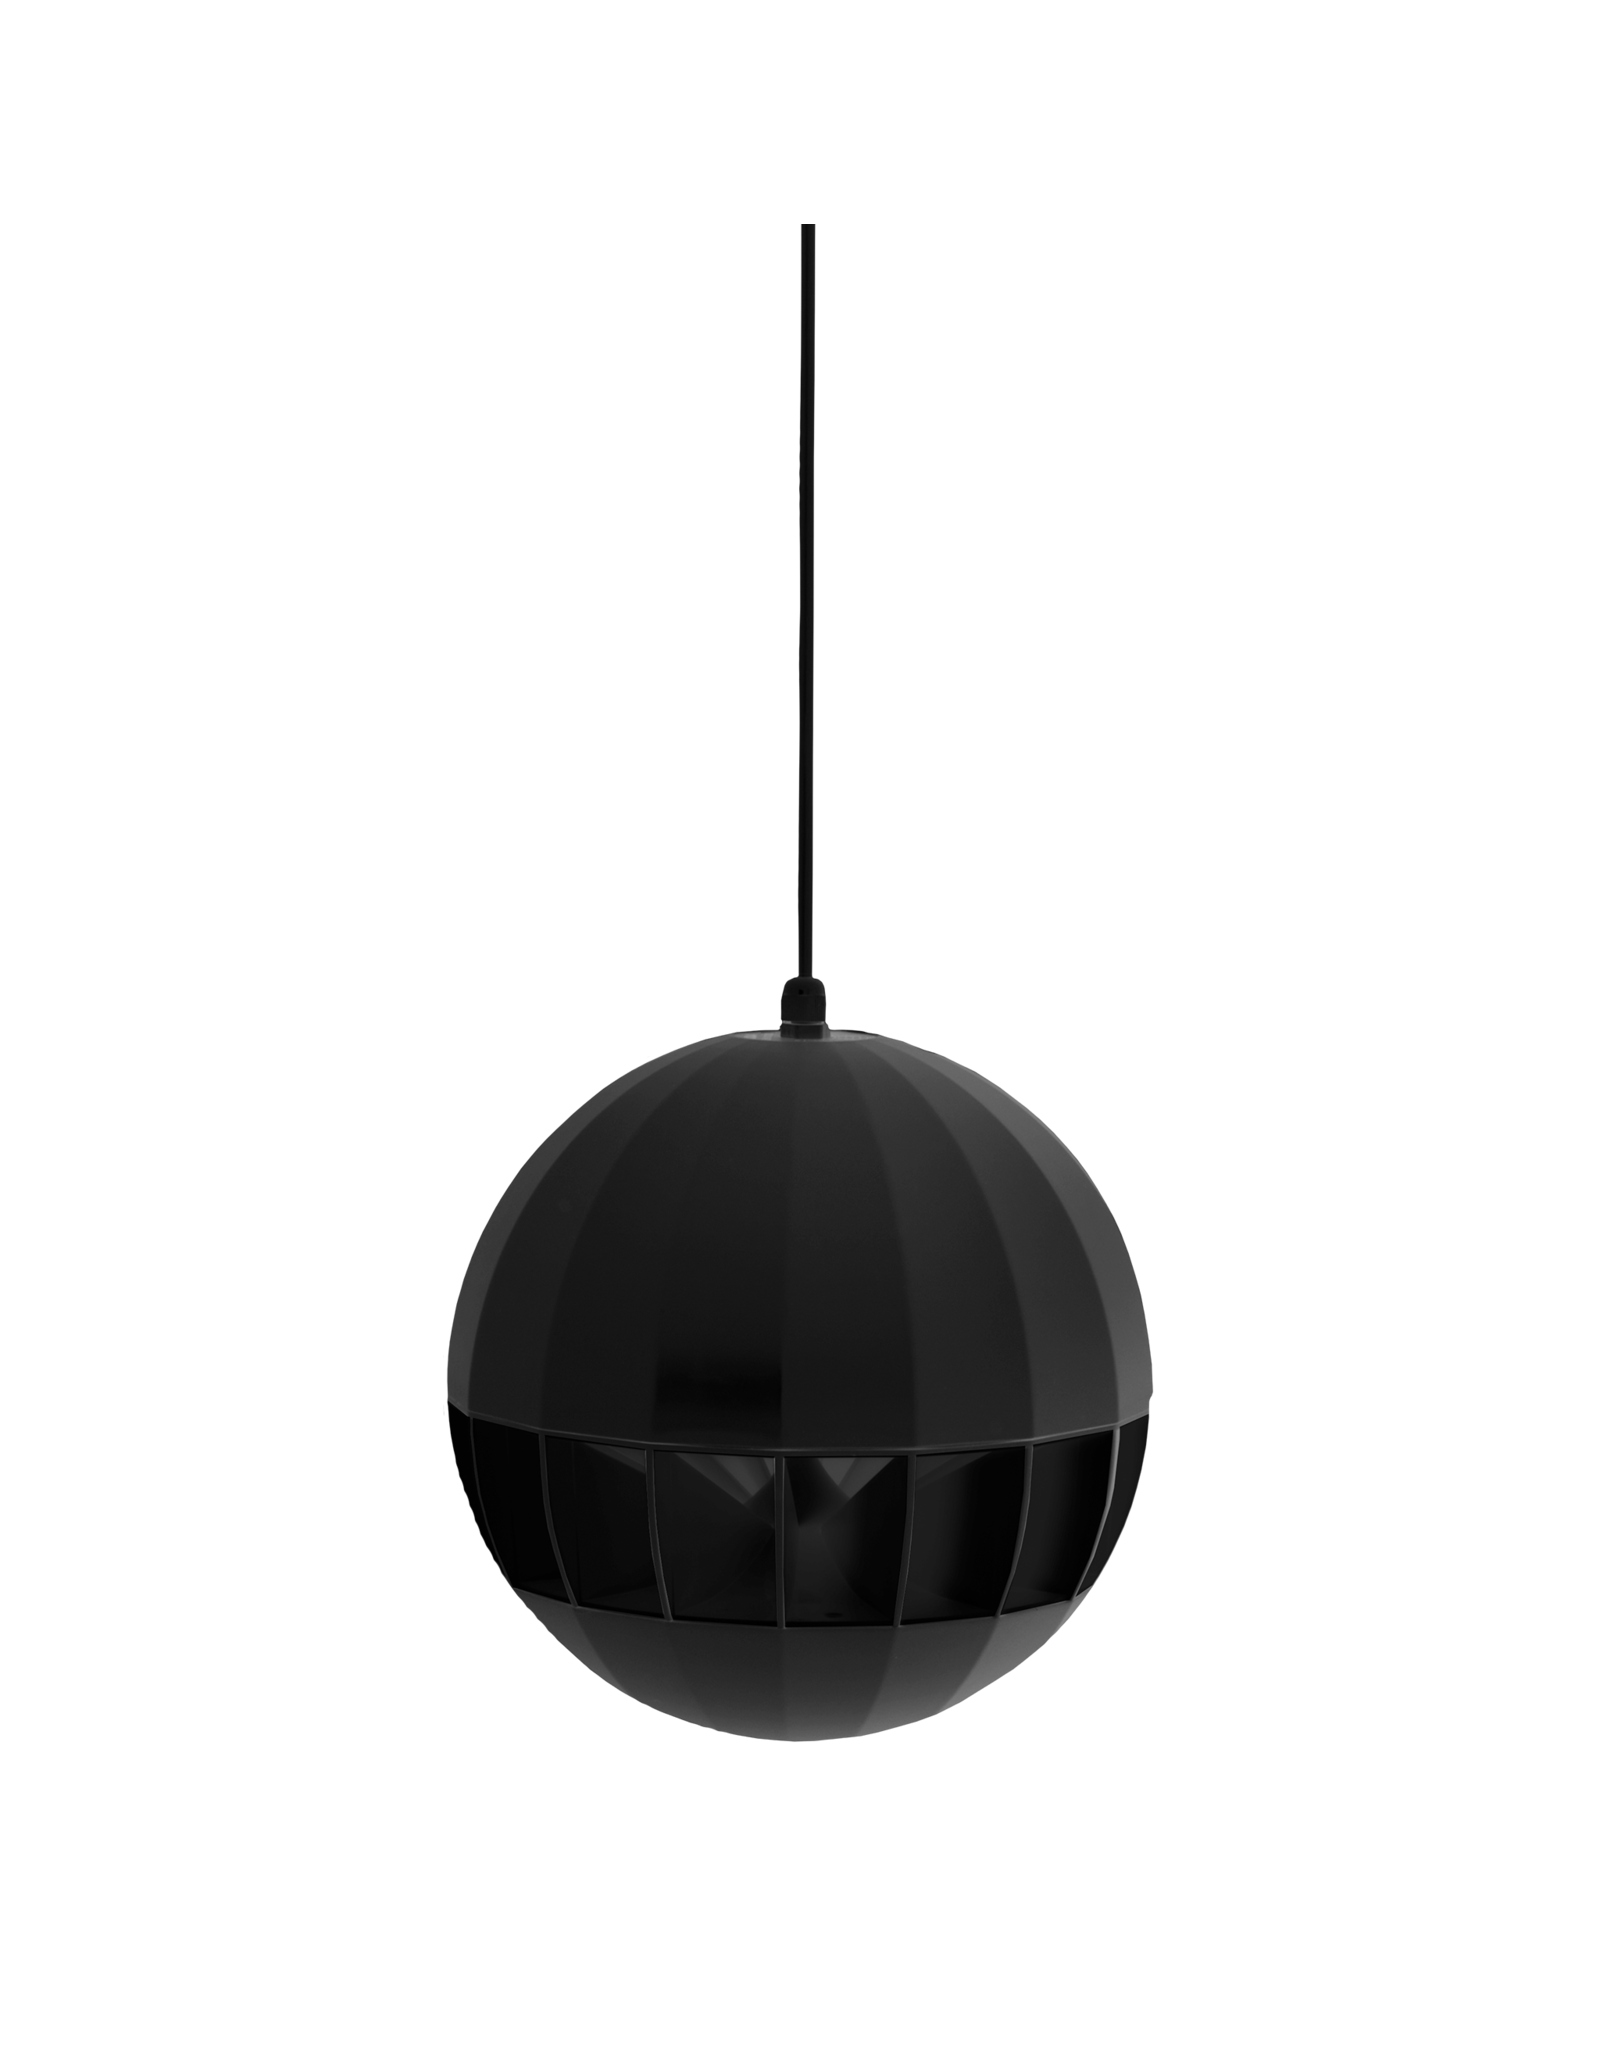 Audac Spherical hanging sound projector Black version - 70/100V